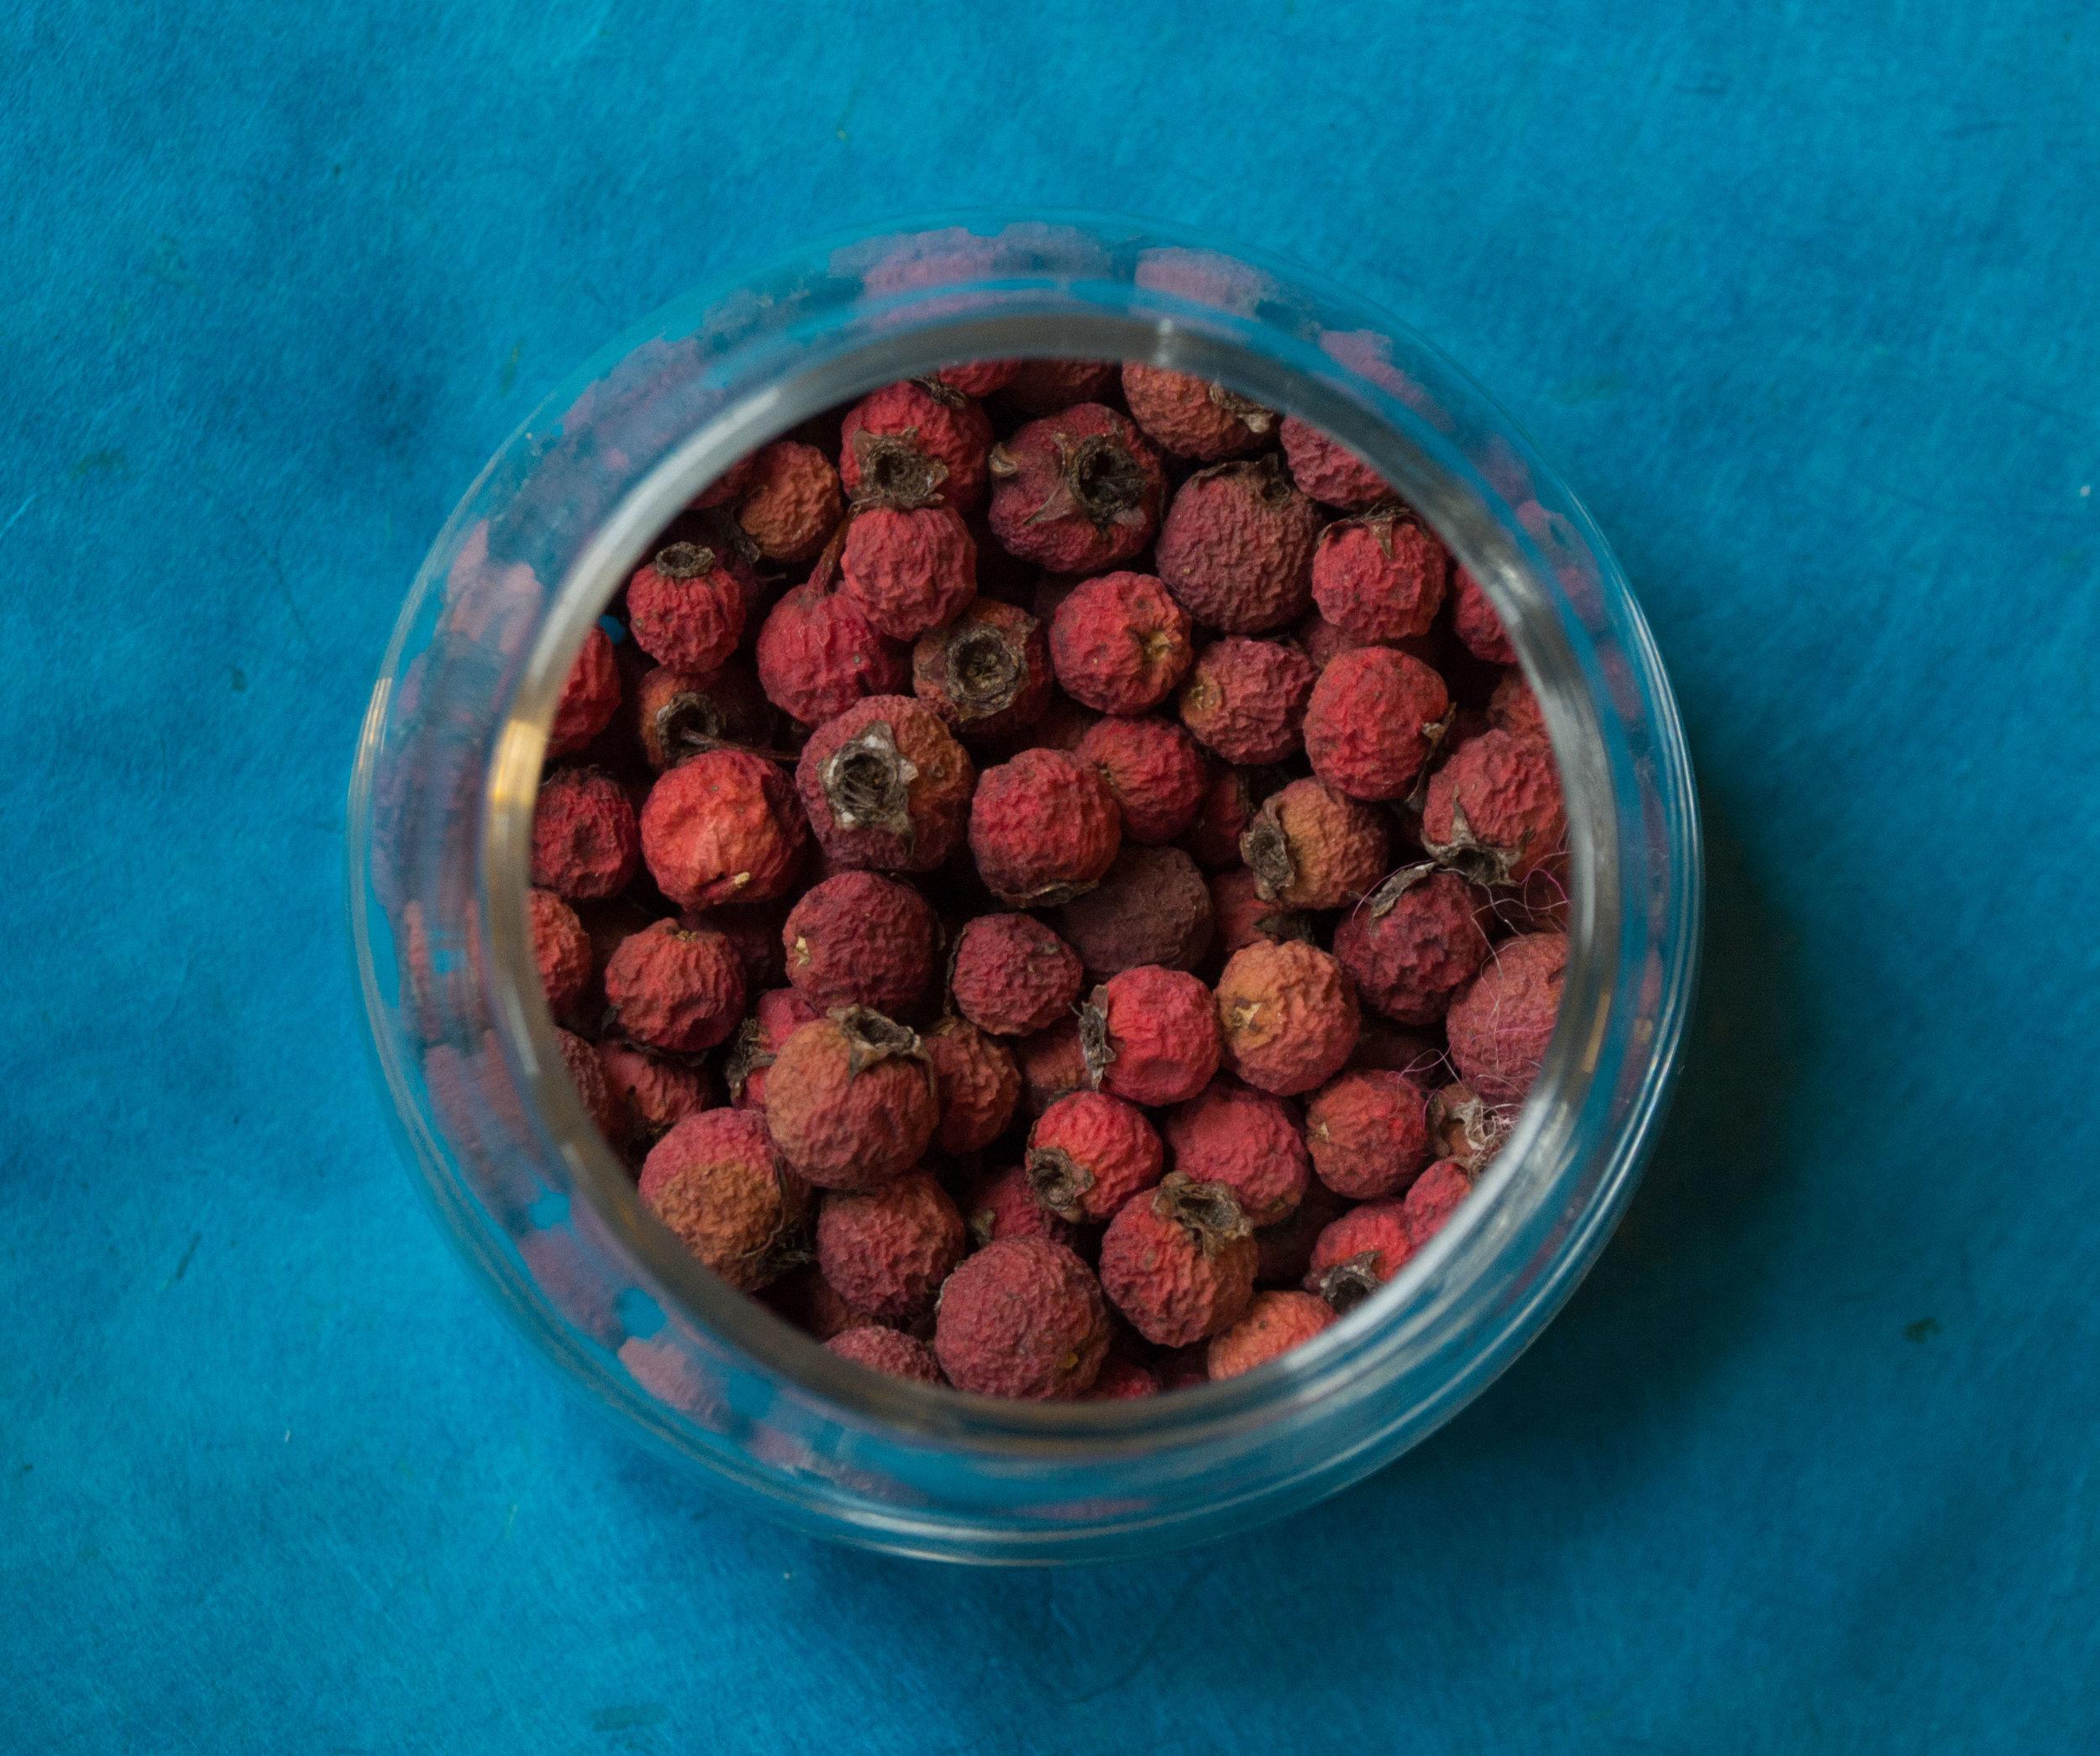 Dried hawthorn berries.